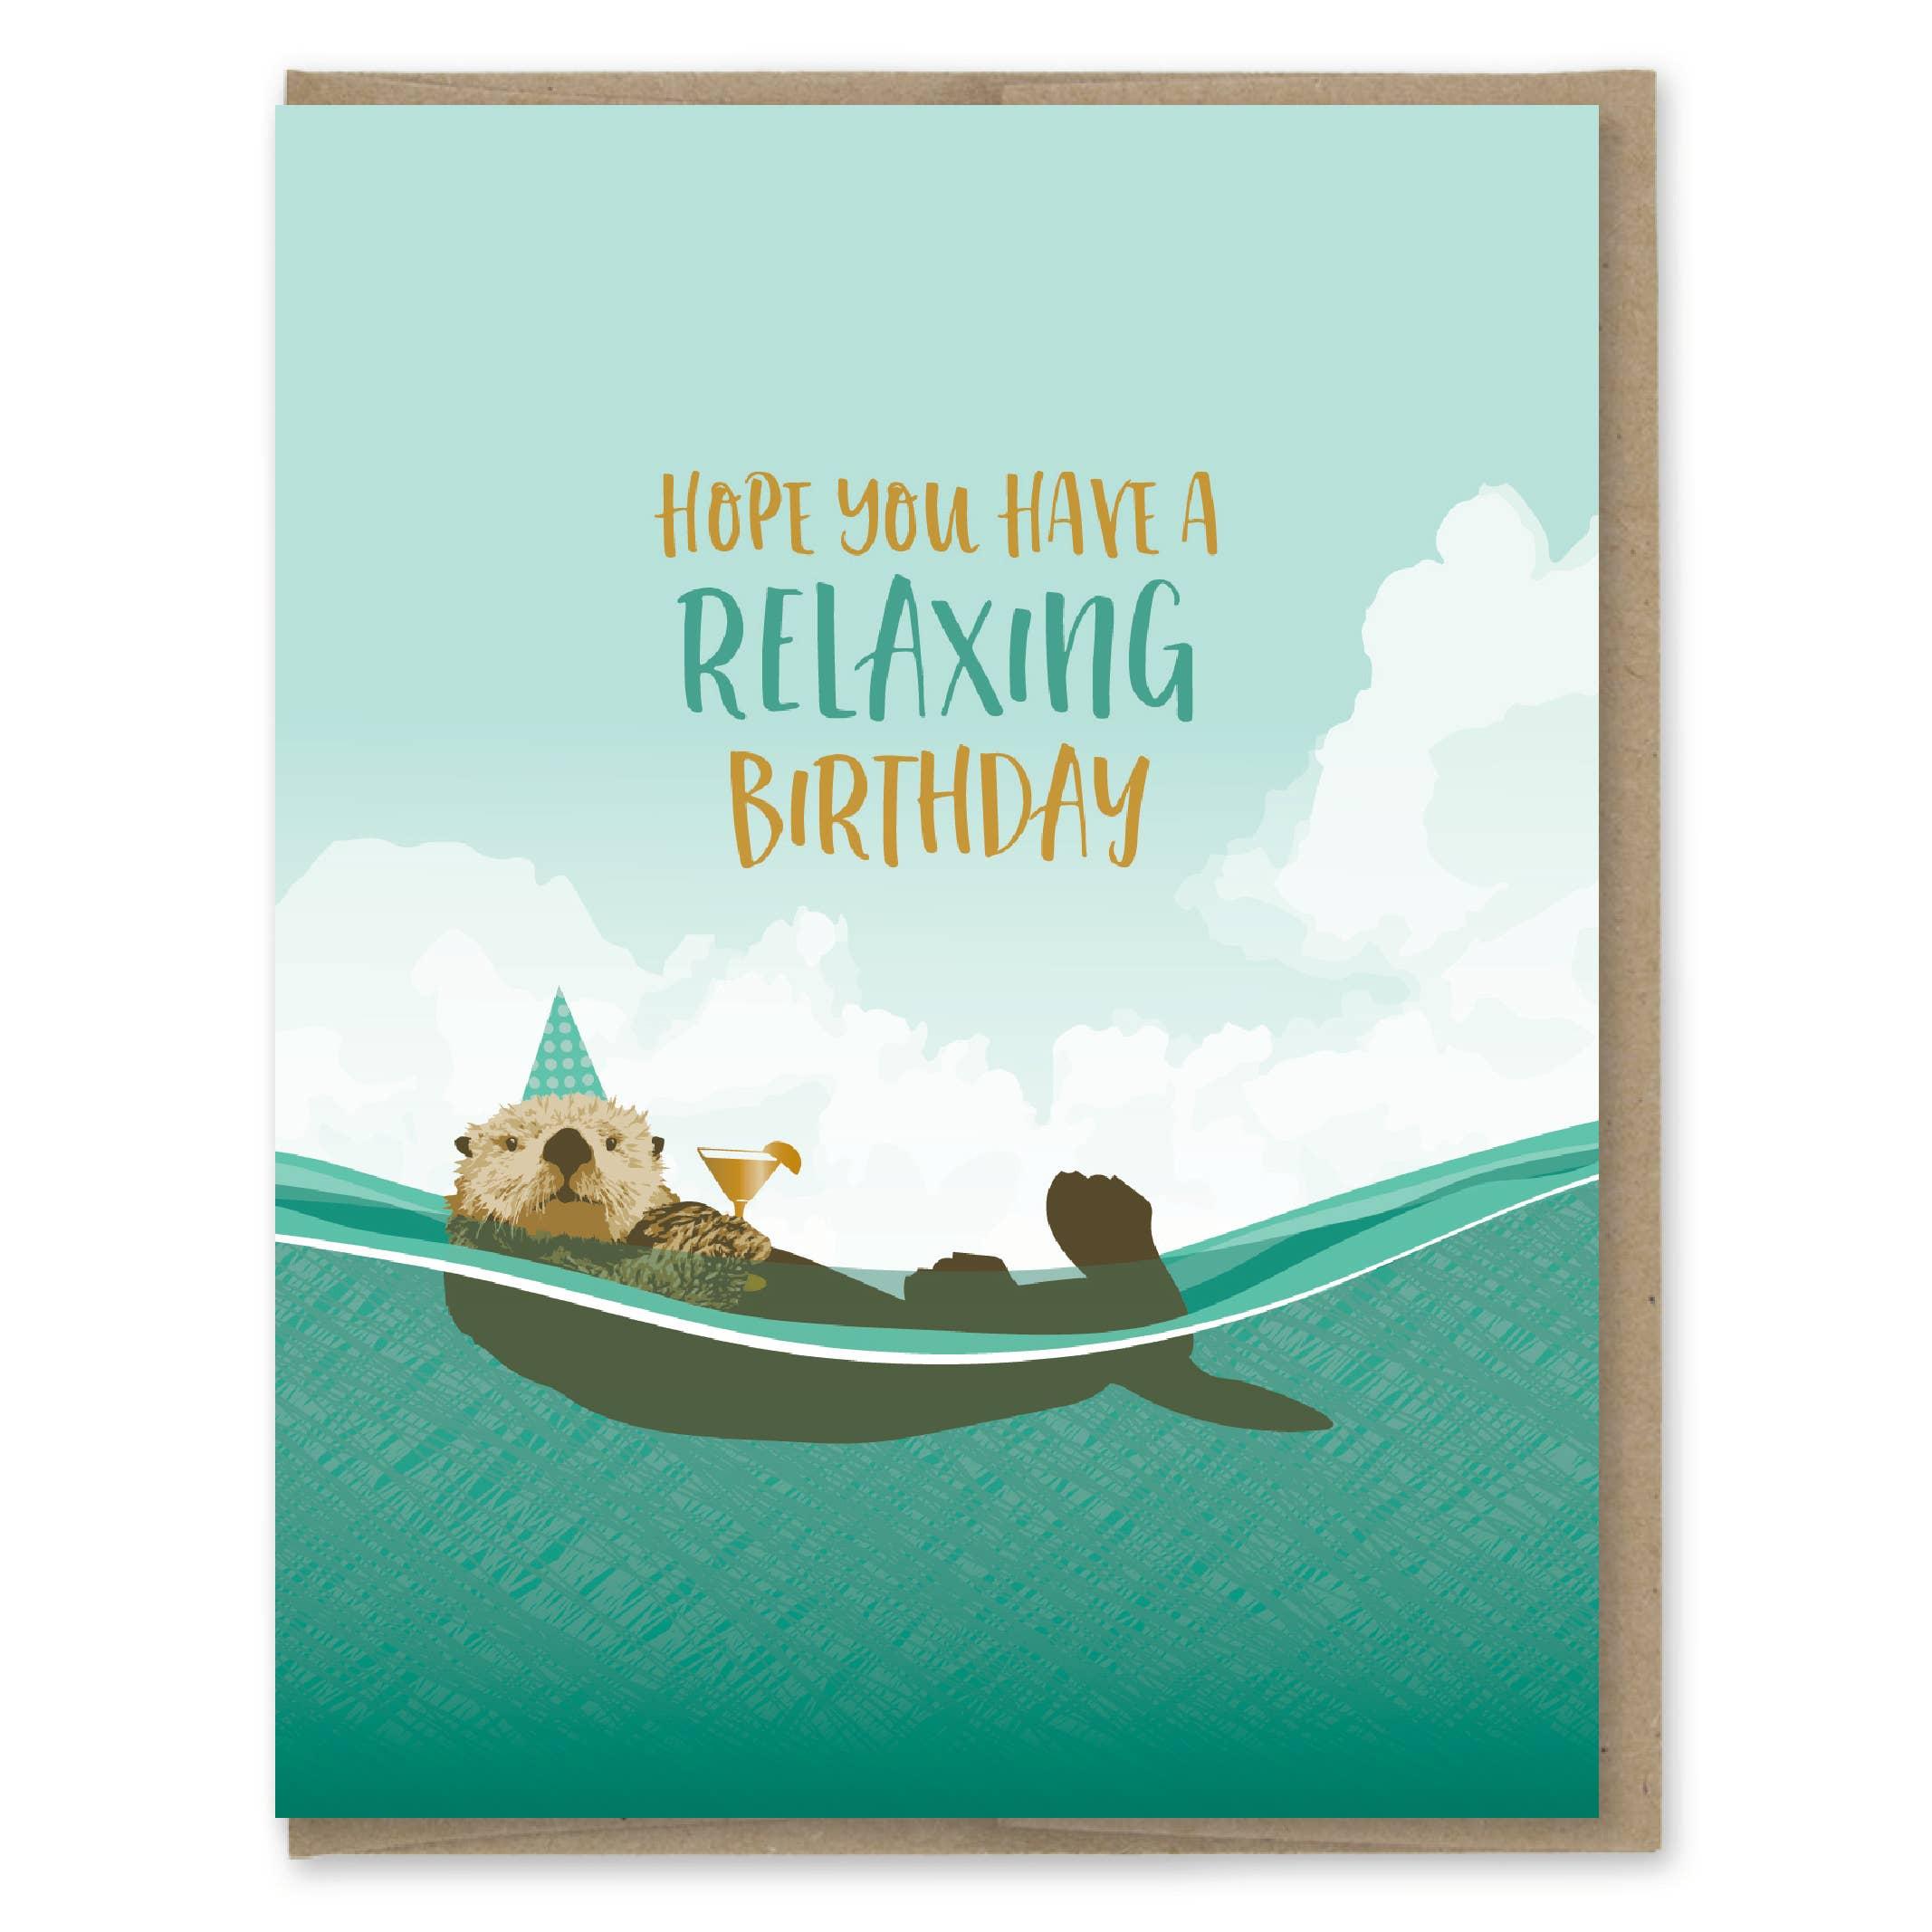 Modern Printed Matter Relaxing Birthday Greeting Card